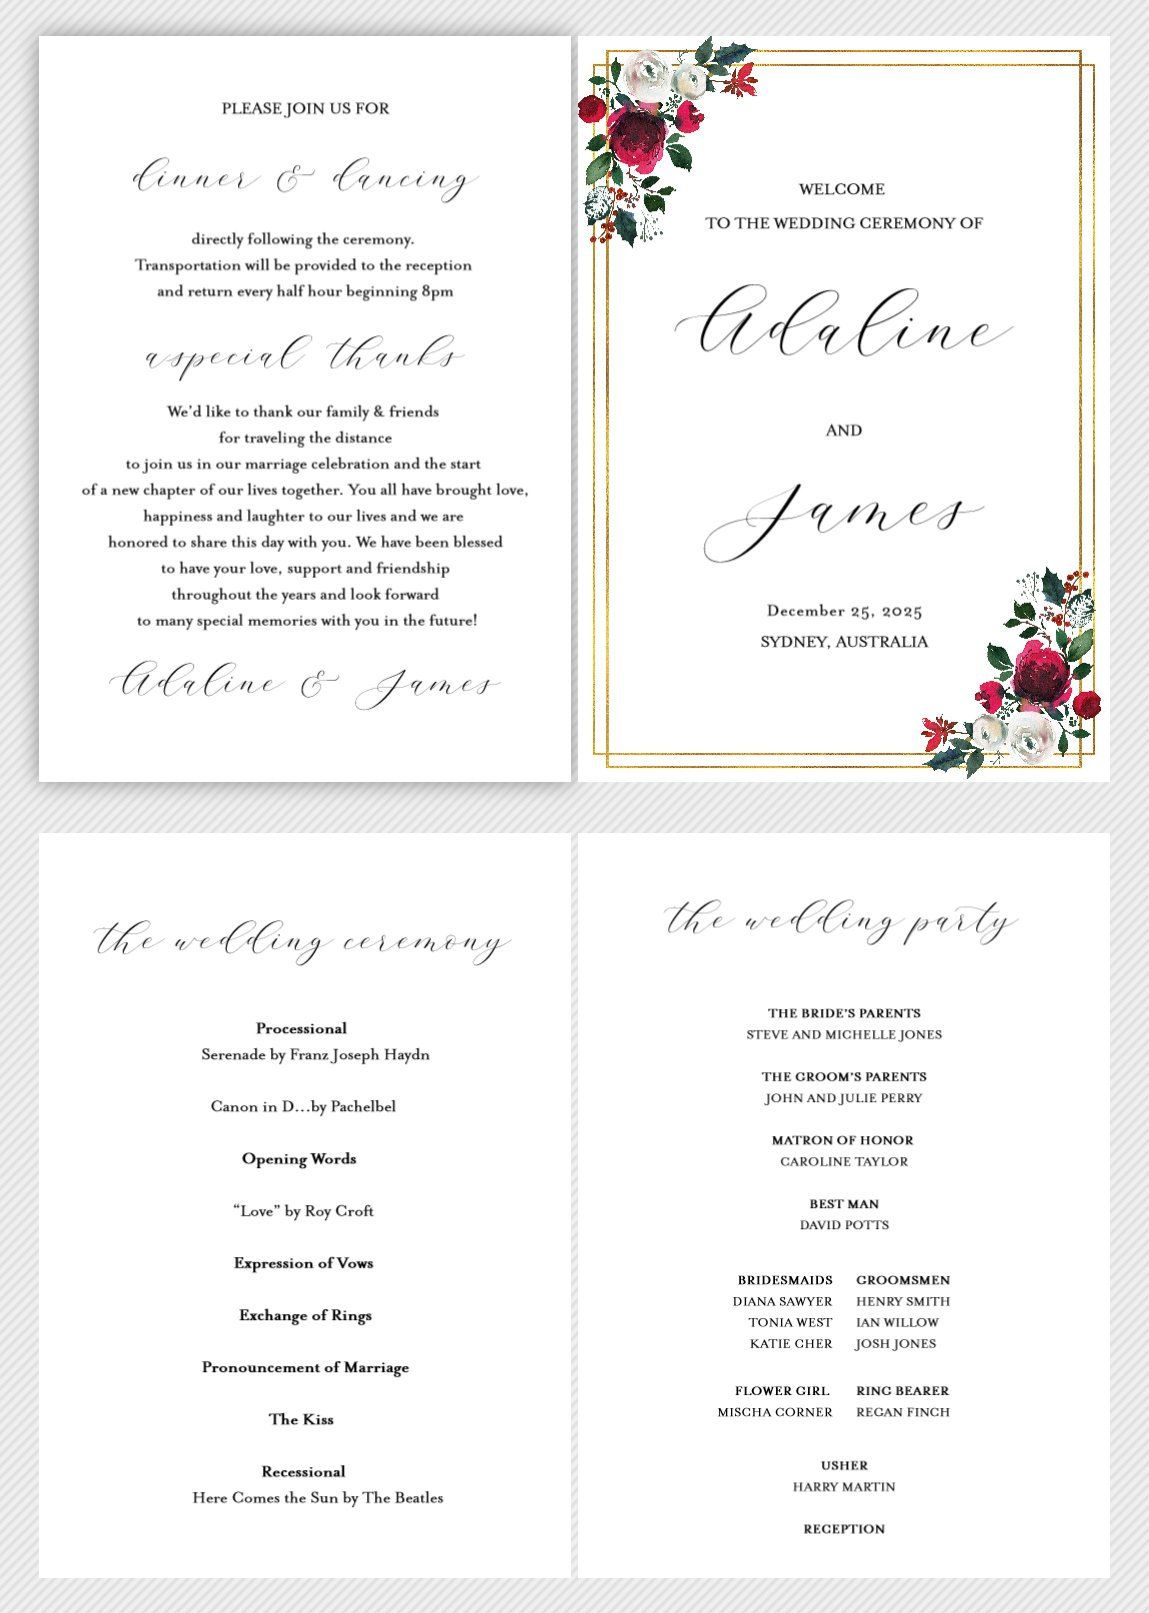 Folded Wedding Ceremony Program Card Editable Template Christmas Weddi Wedding Ceremony Programs Wedding Ceremony Programs Template Wedding Order Of Service